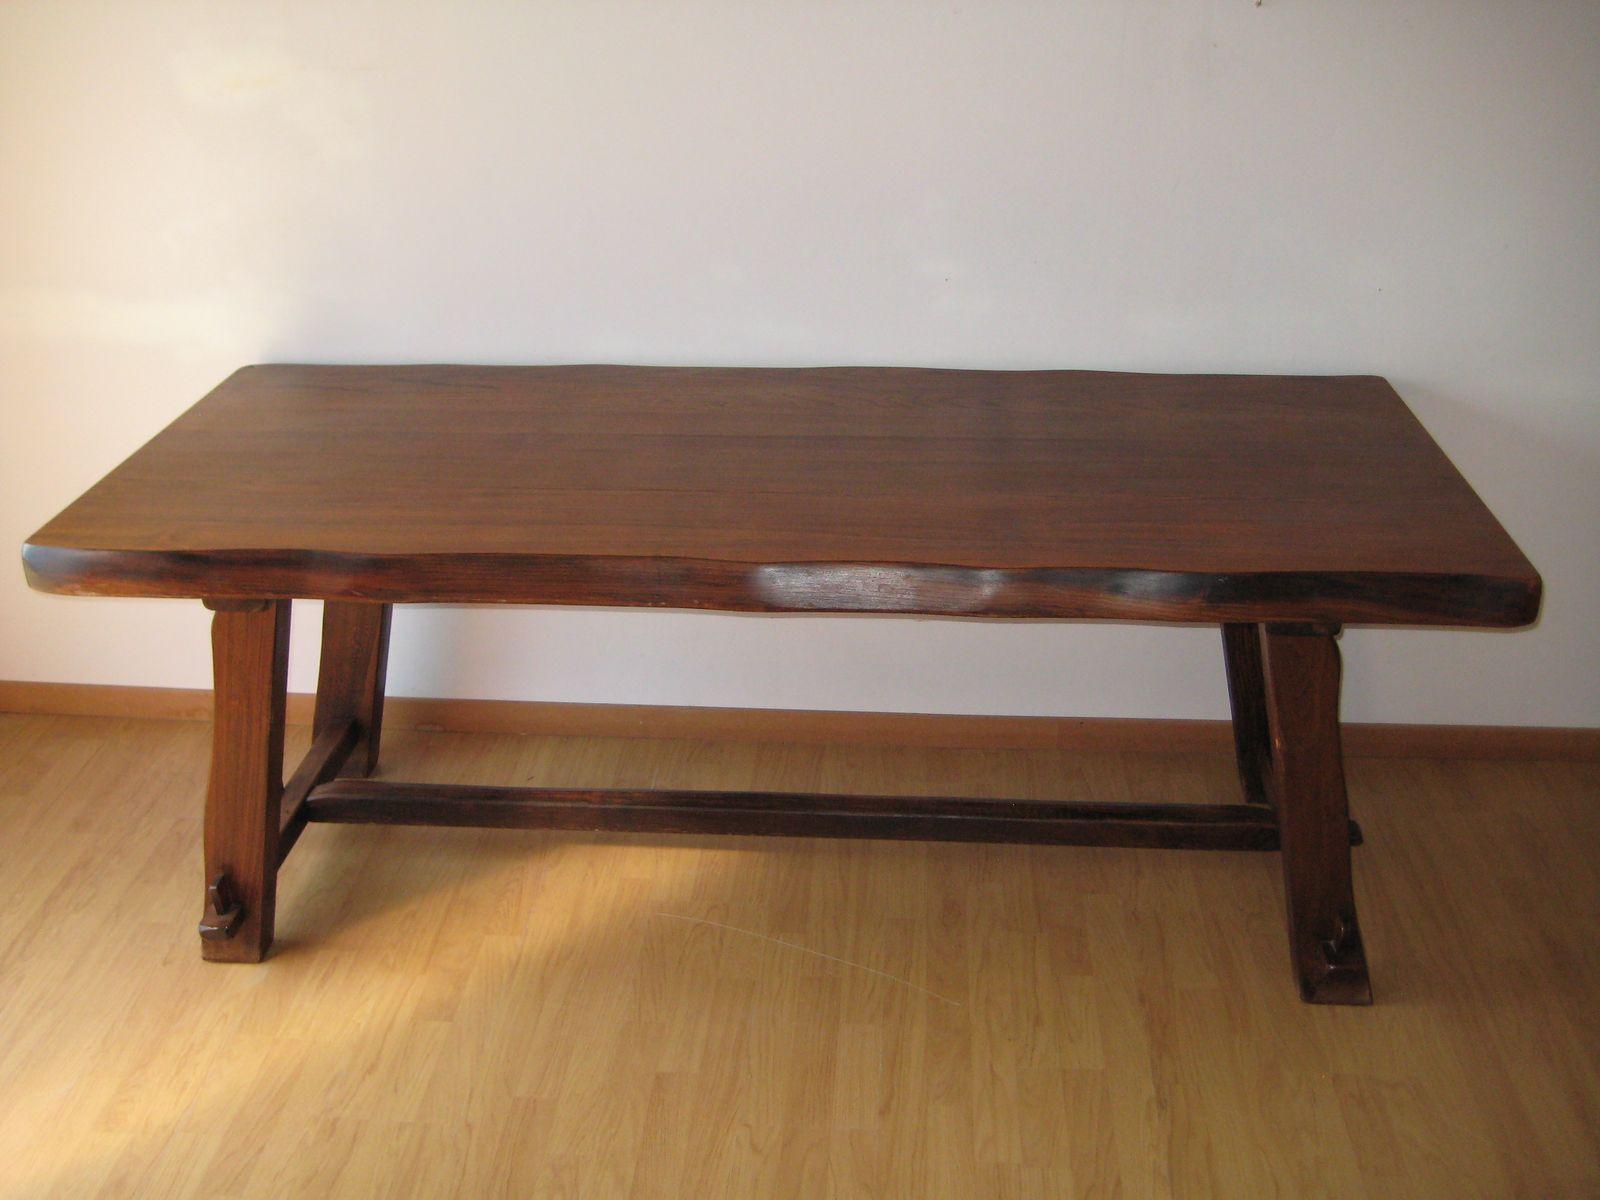 table de salle manger t vintage scandinave par olavi hanninen en vente sur pamono. Black Bedroom Furniture Sets. Home Design Ideas